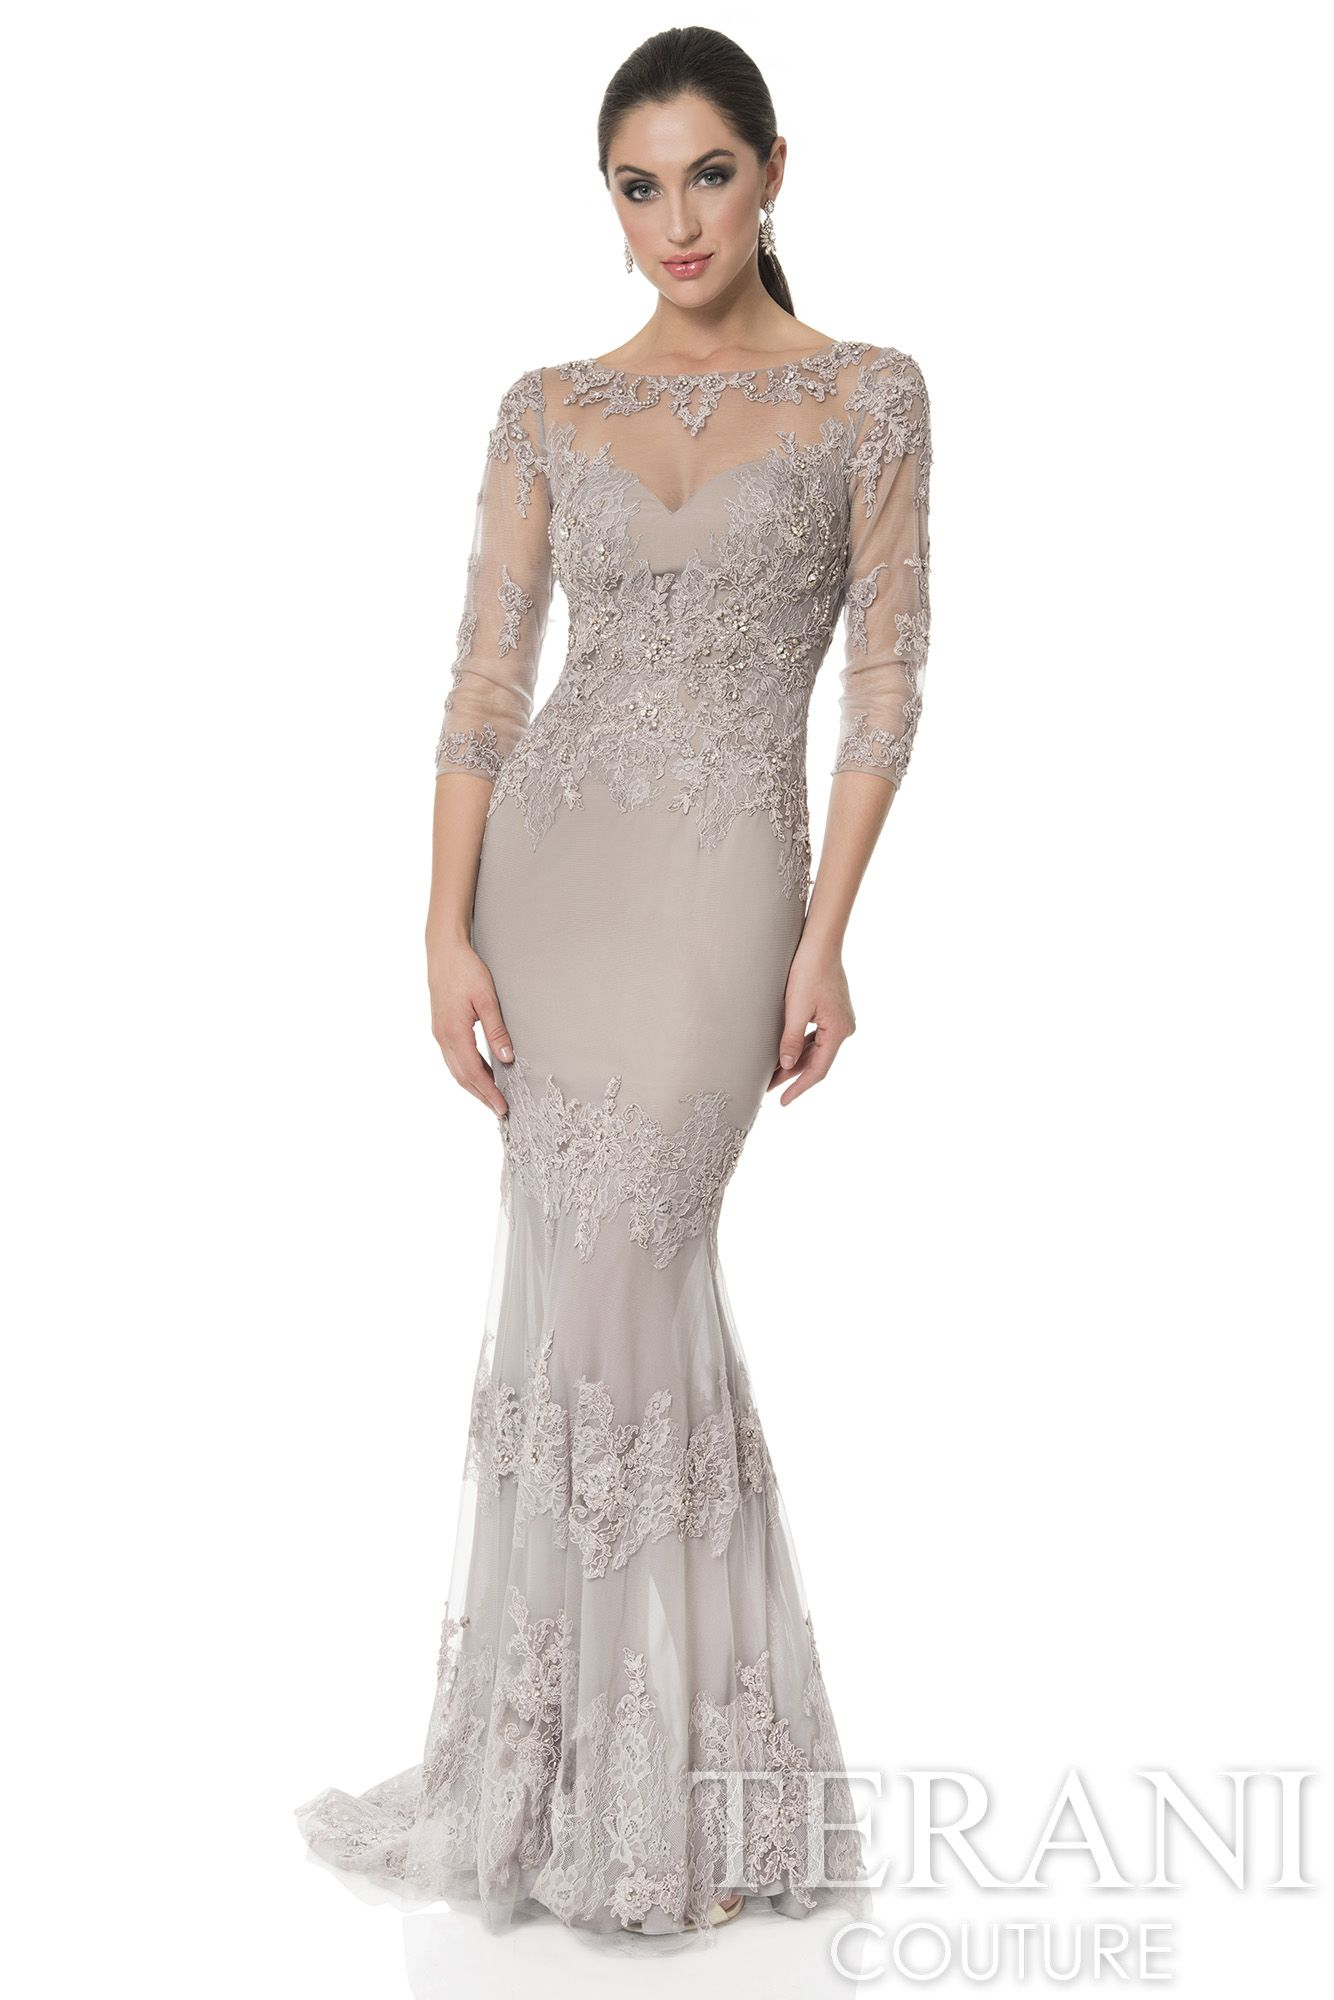 Terani couture 2016 prom dresses evening dresses for Terani couture wedding dresses